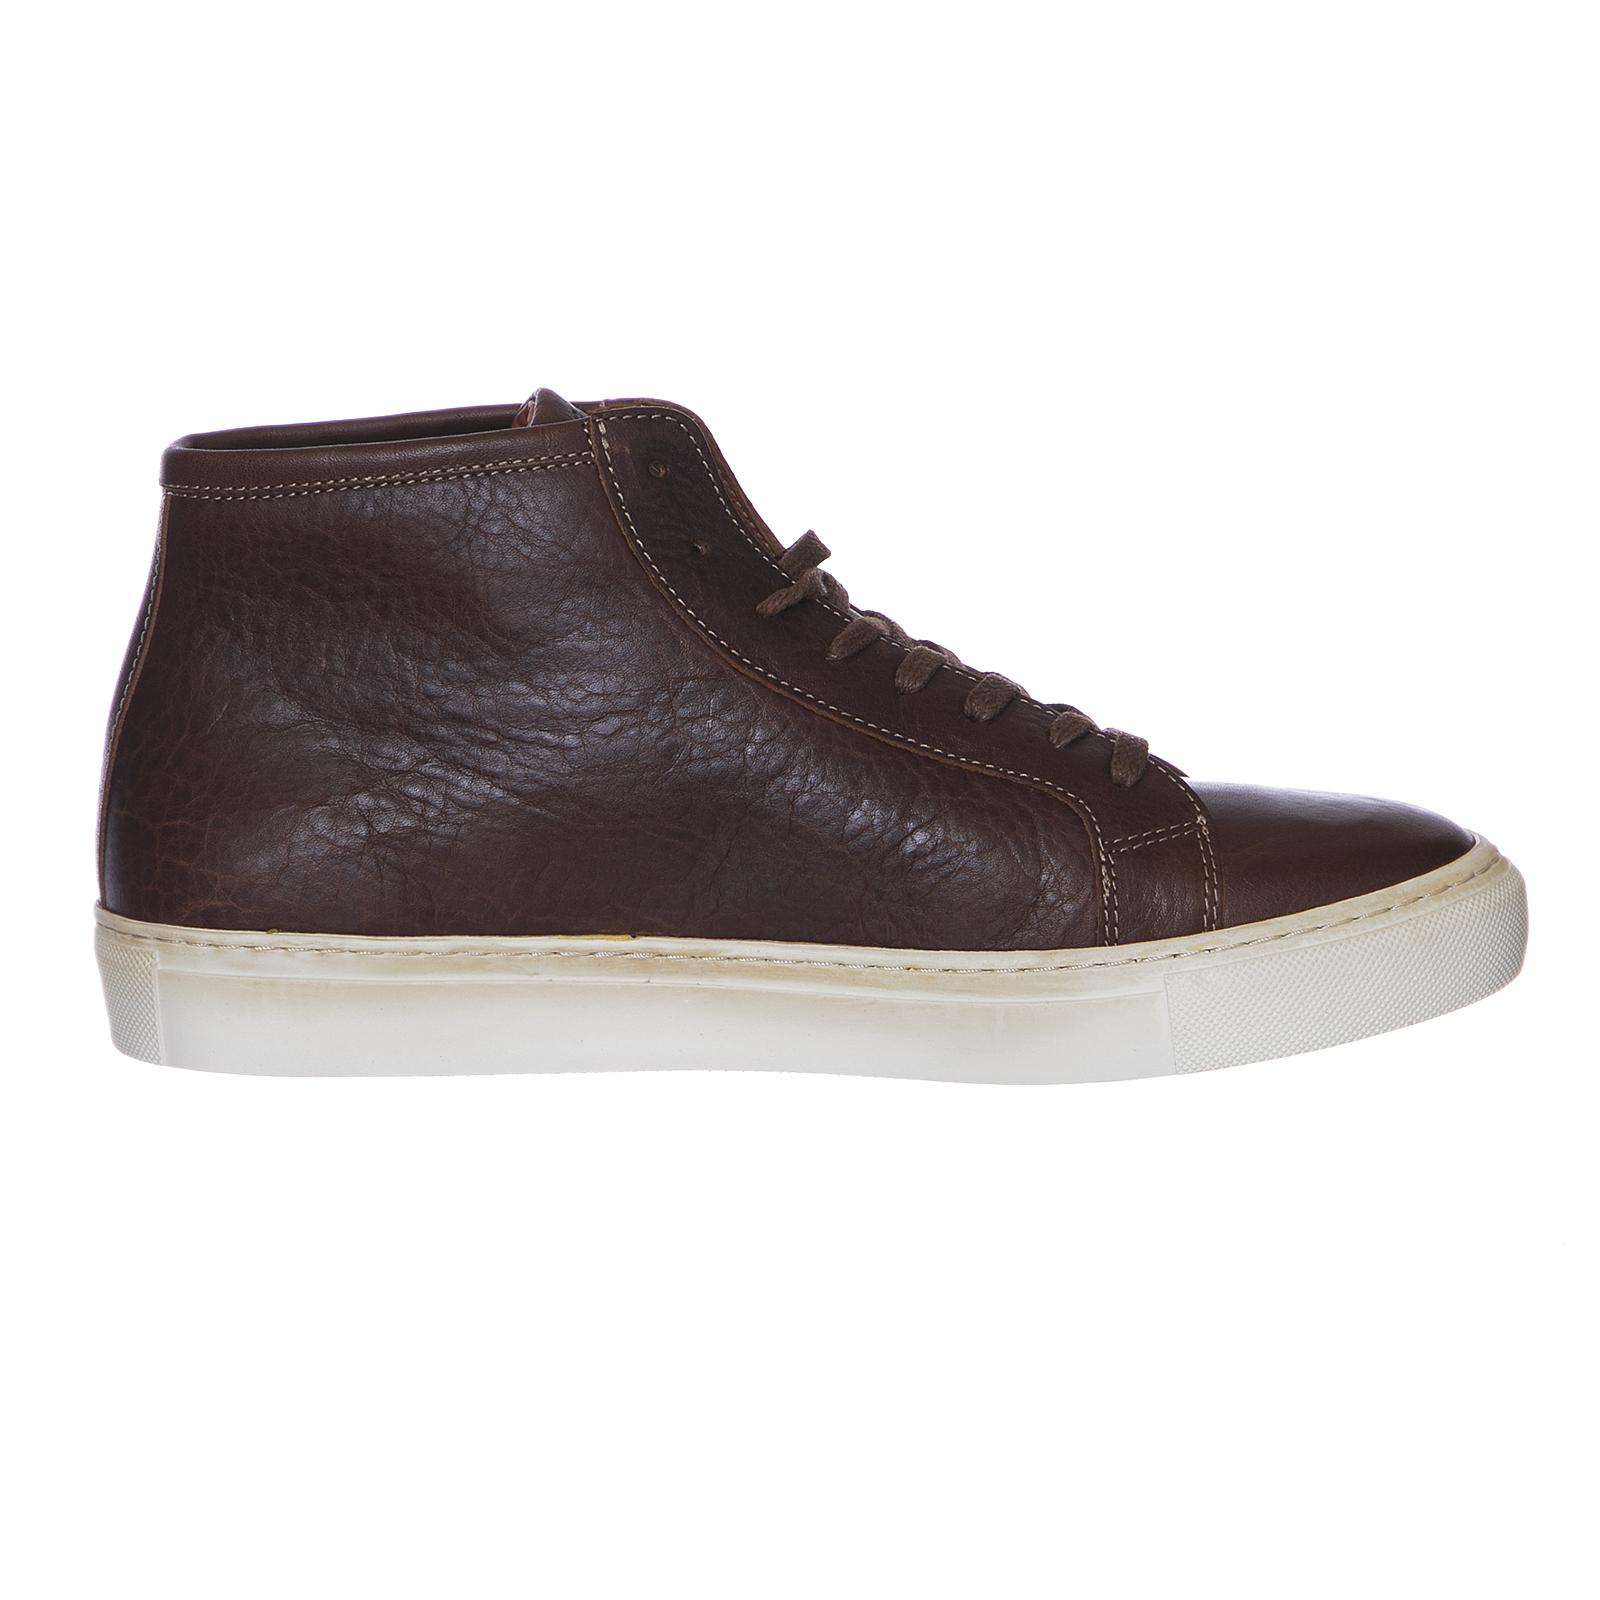 Legends scarpe da ginnastica ginnastica ginnastica Resort High Cognac Off bianca Marronee | Moda Attraente  63fe2f